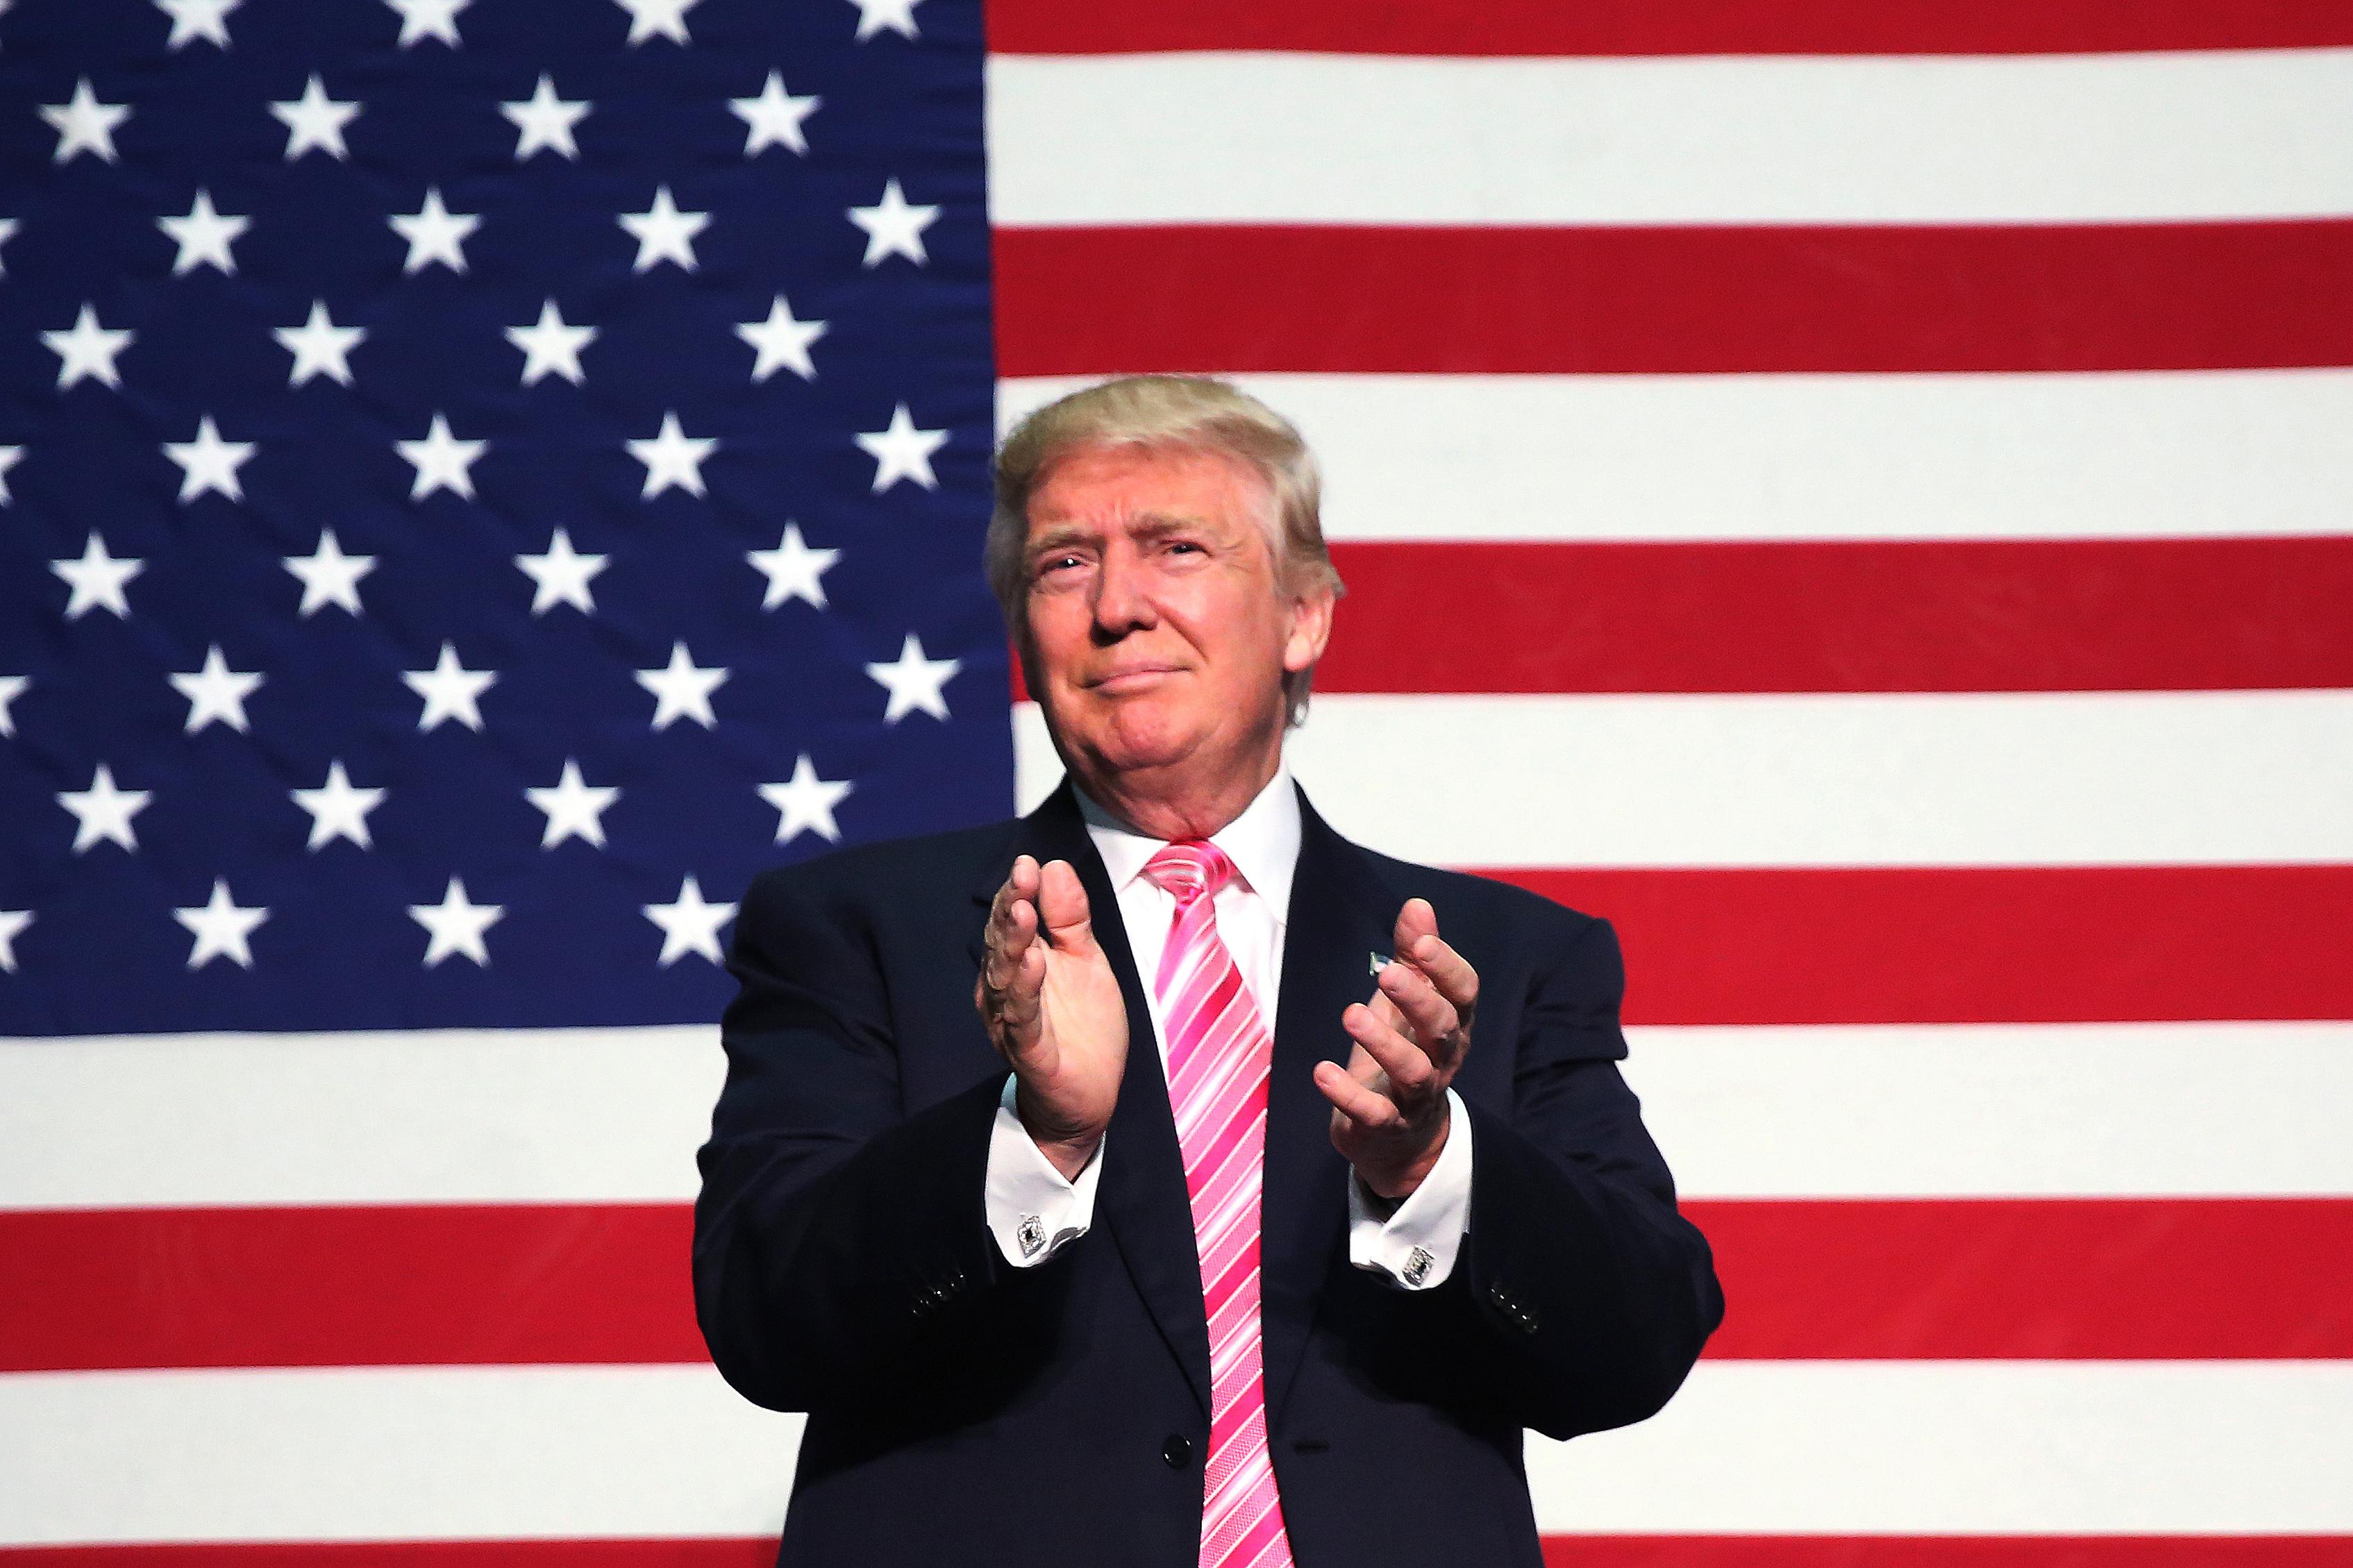 Трамп подпишет новый указ об иммигрантах. Фото: pbs.org